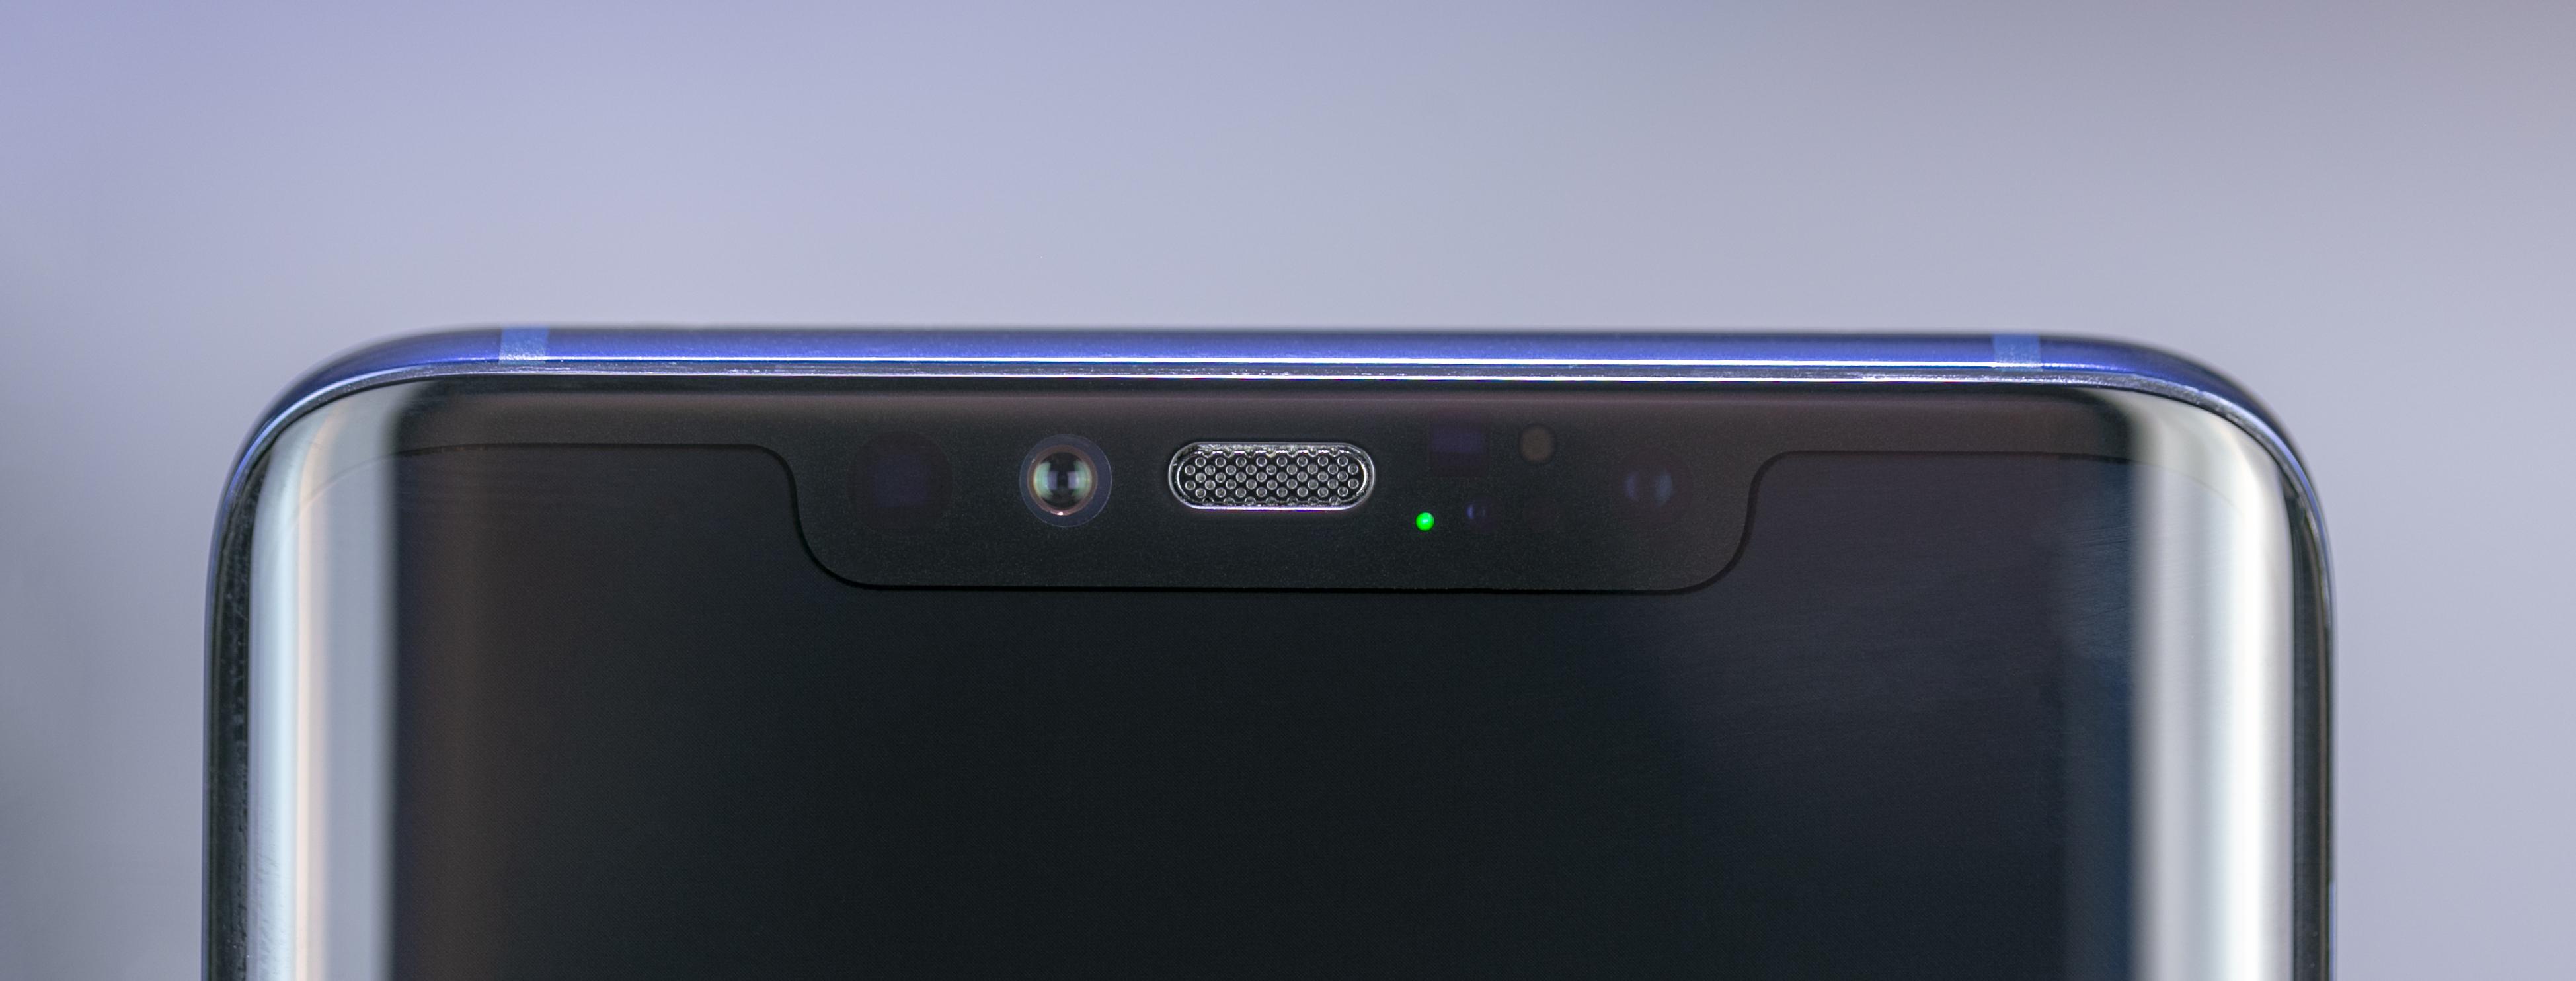 Huawei Mate 20 Pro (11)